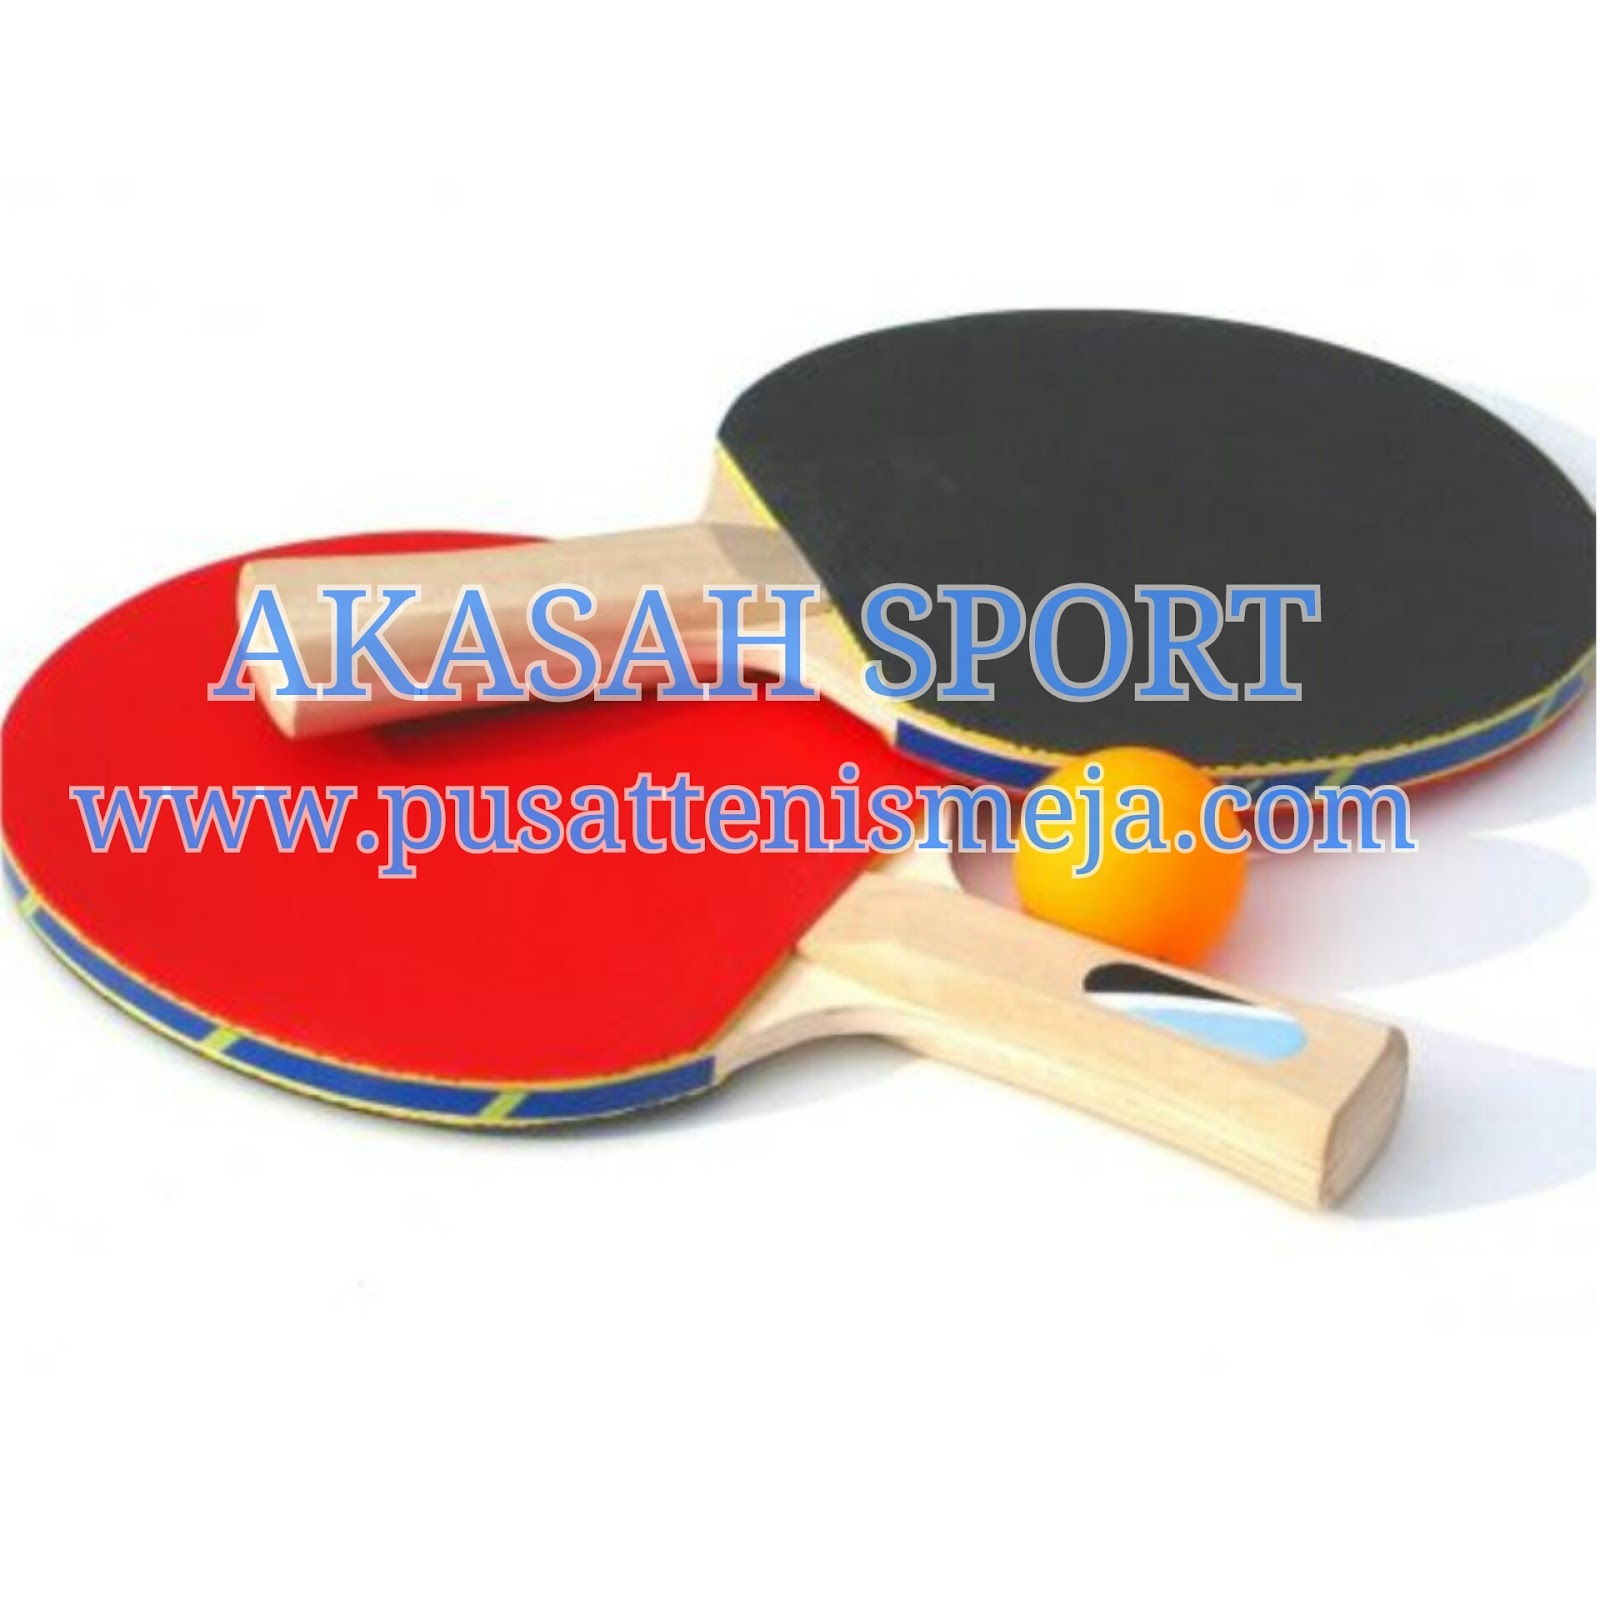 Juni 2016 ~ 082298472484 Jual Tenis Meja Pingpong Bed Net Bola Murah ... f8e655fbff